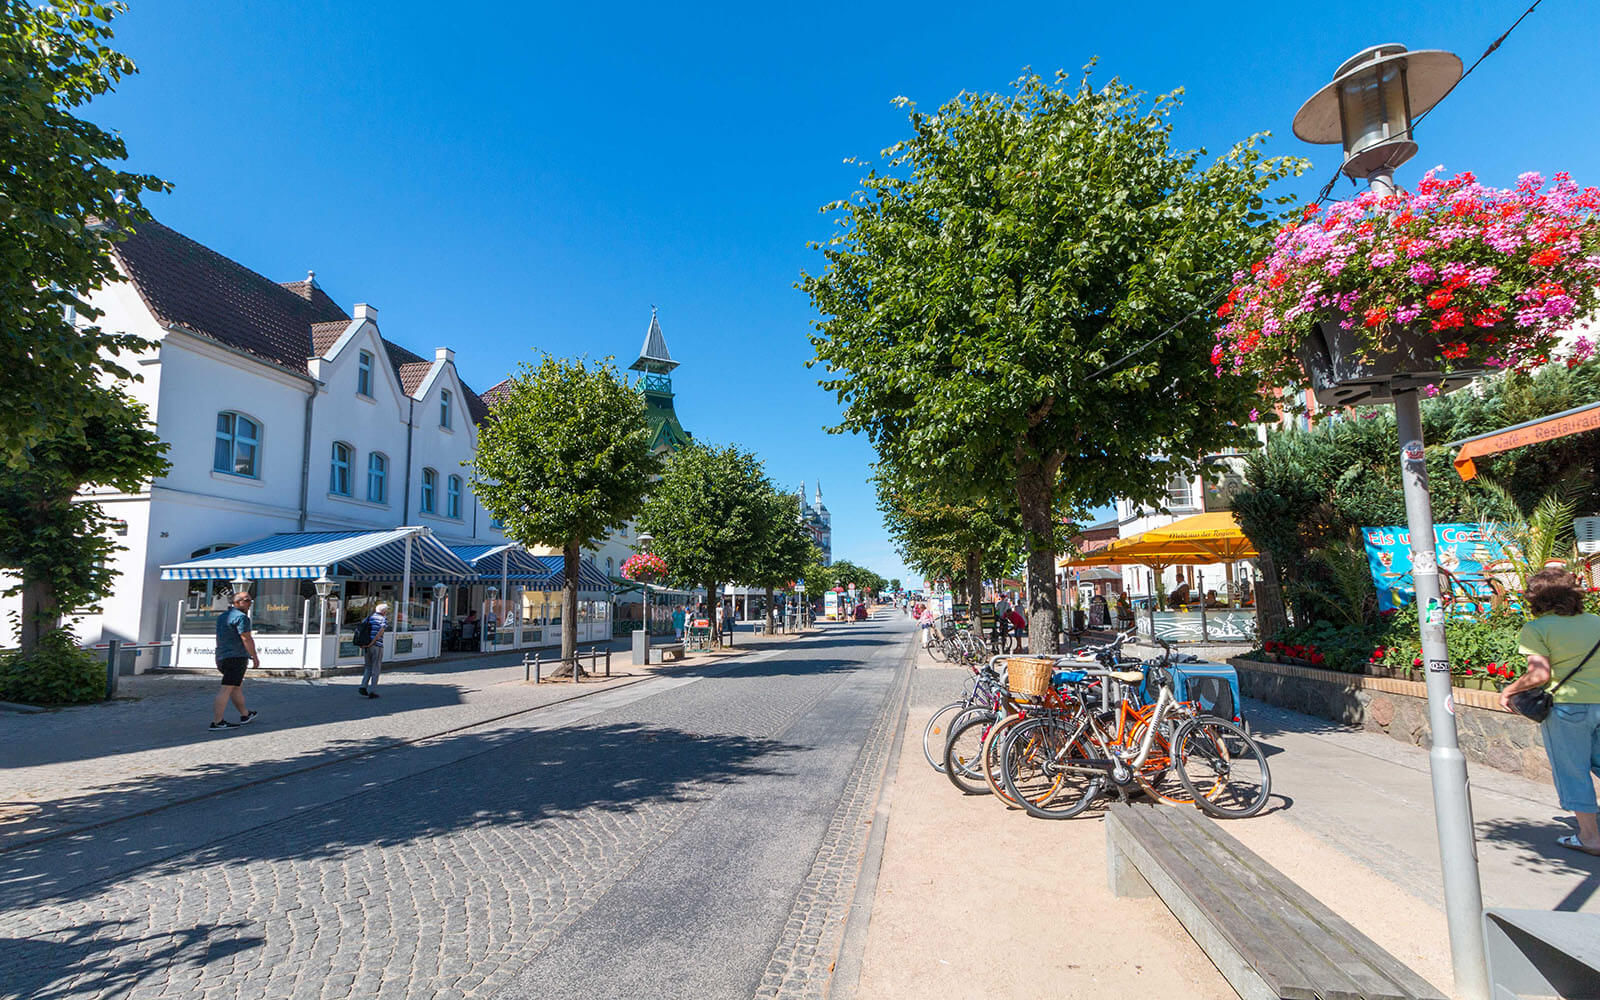 Centrum miasta Zinnowitz